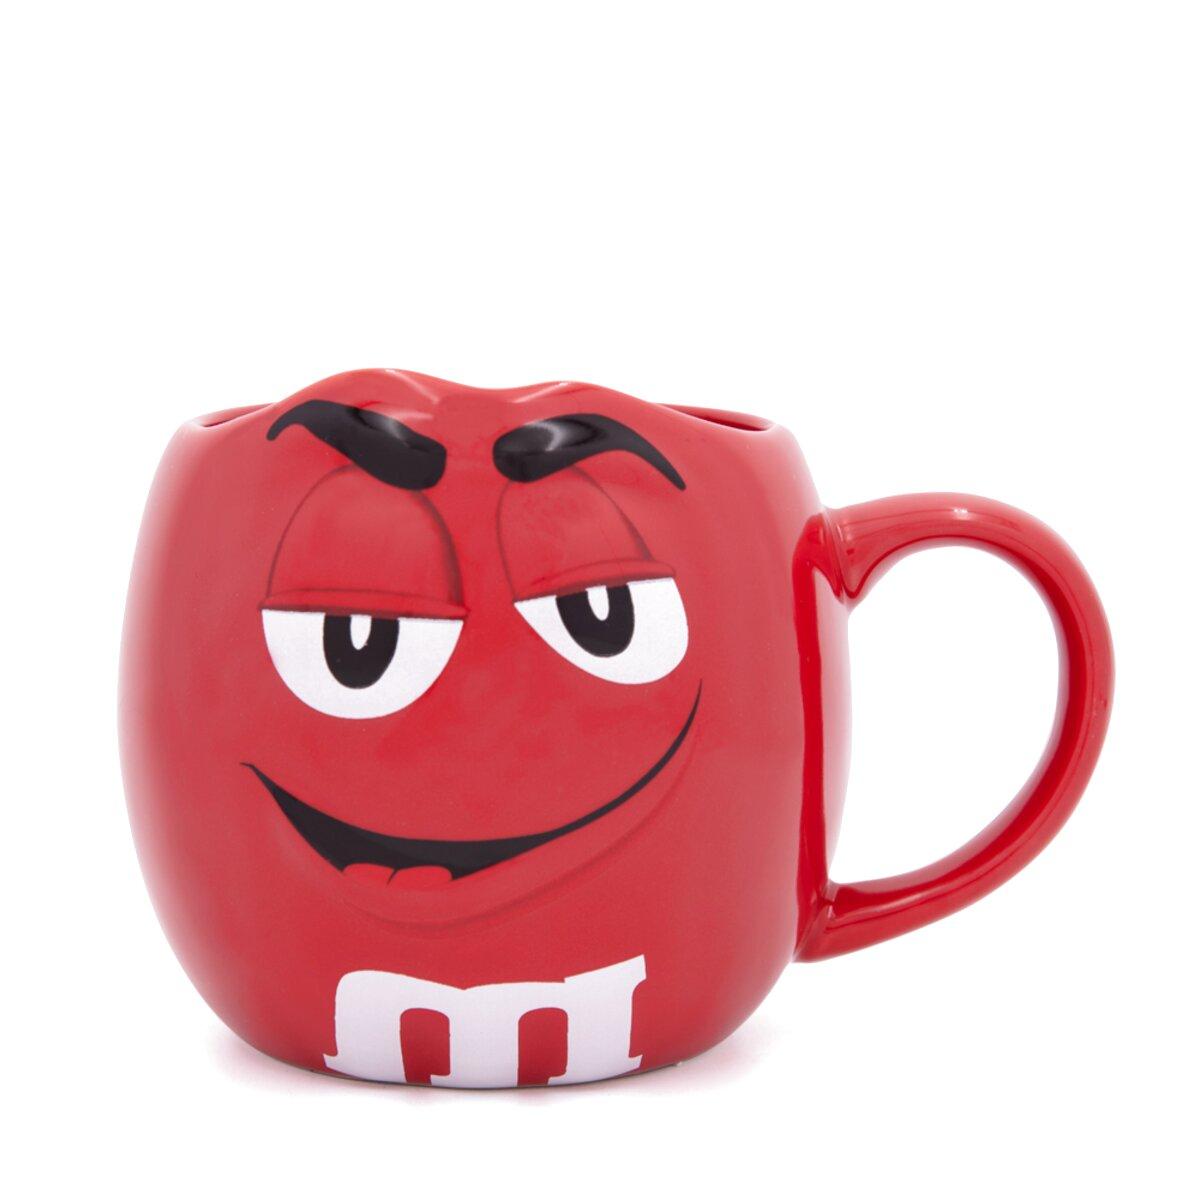 m m mug for sale